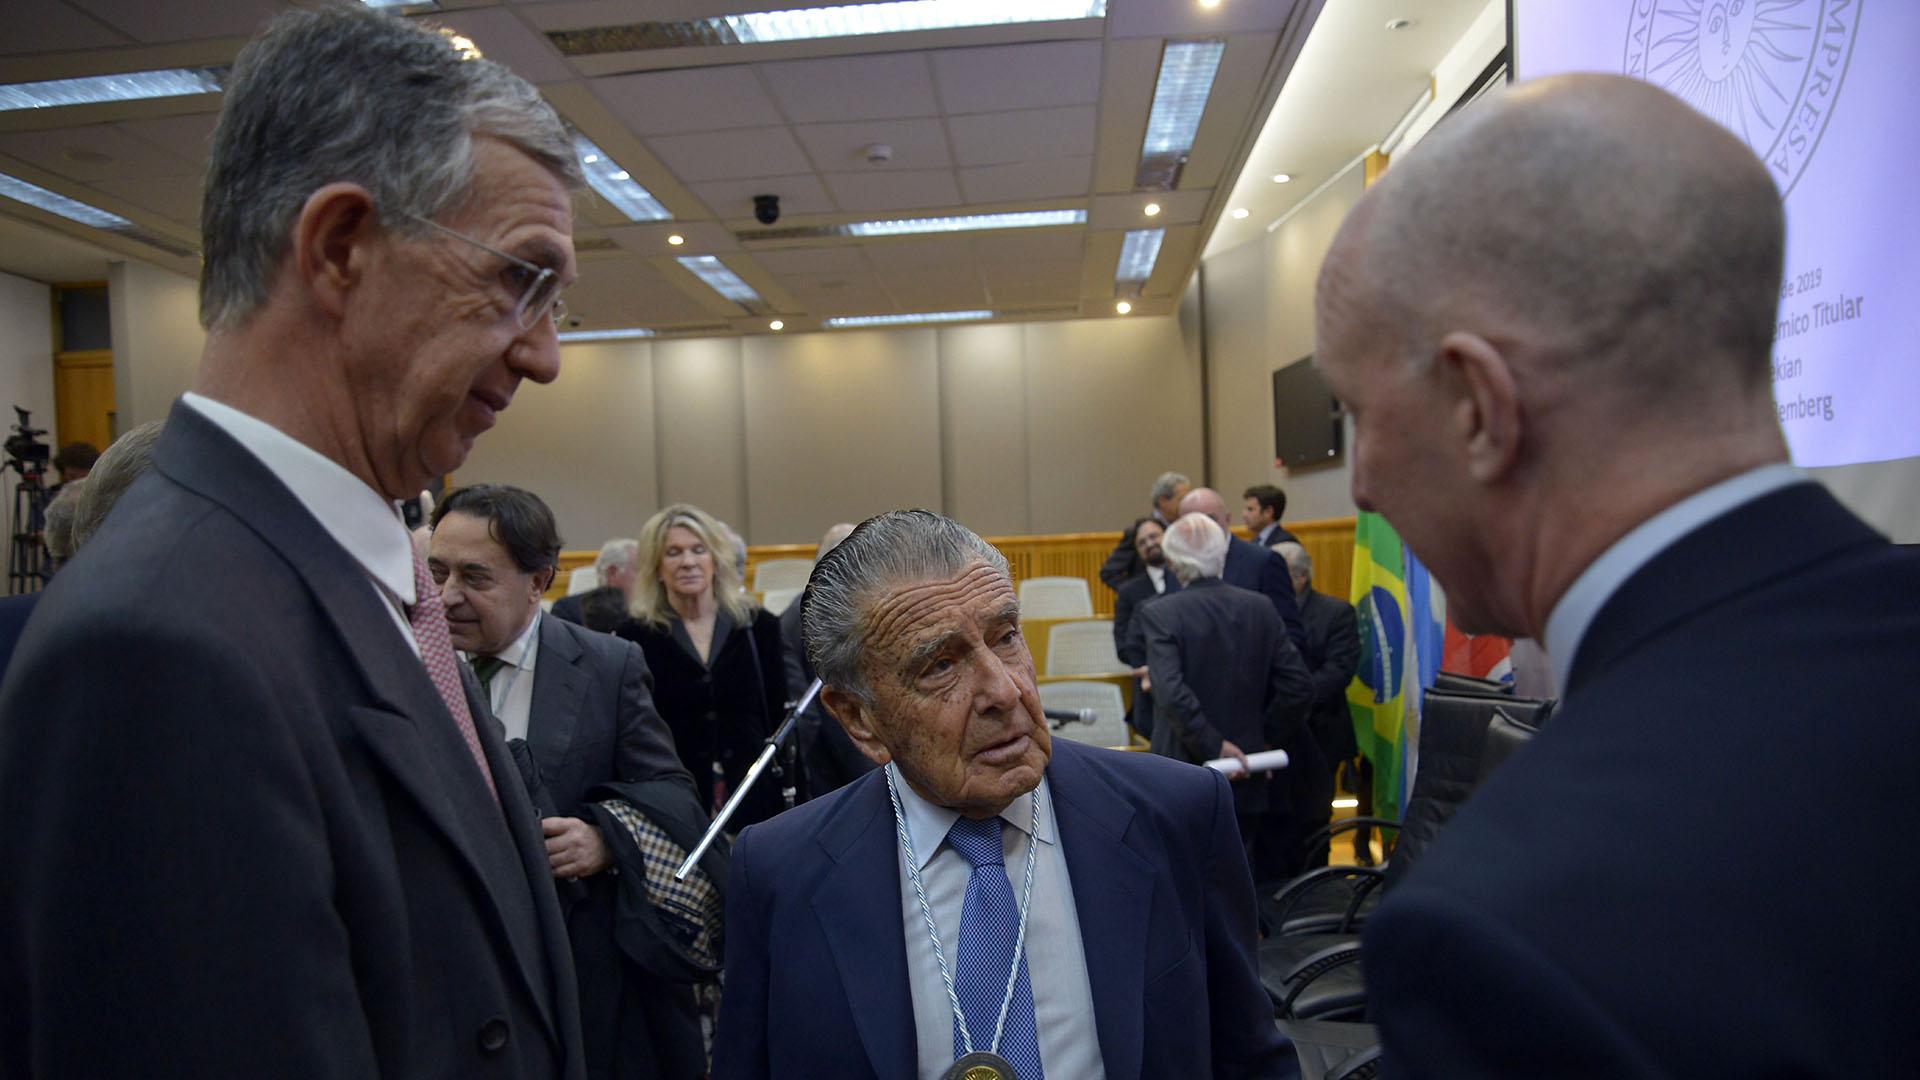 Eurnekian dialoga con los embajadores de Brasil e Inglaterra, Sergio França Danese y Mark Kent